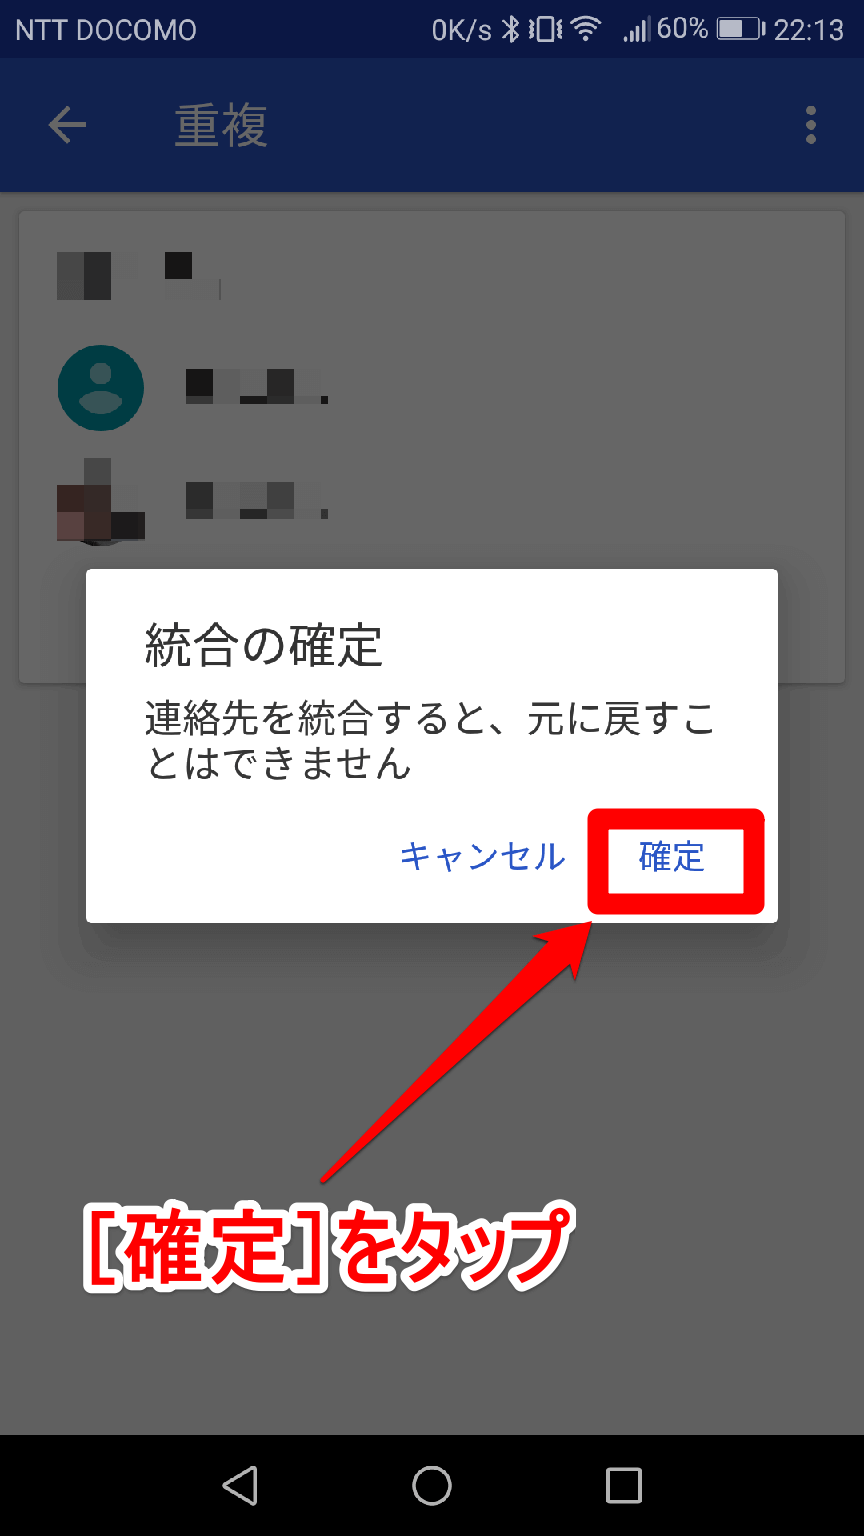 Google連絡帳アプリで重複を統合する時の[統合の確定]画面